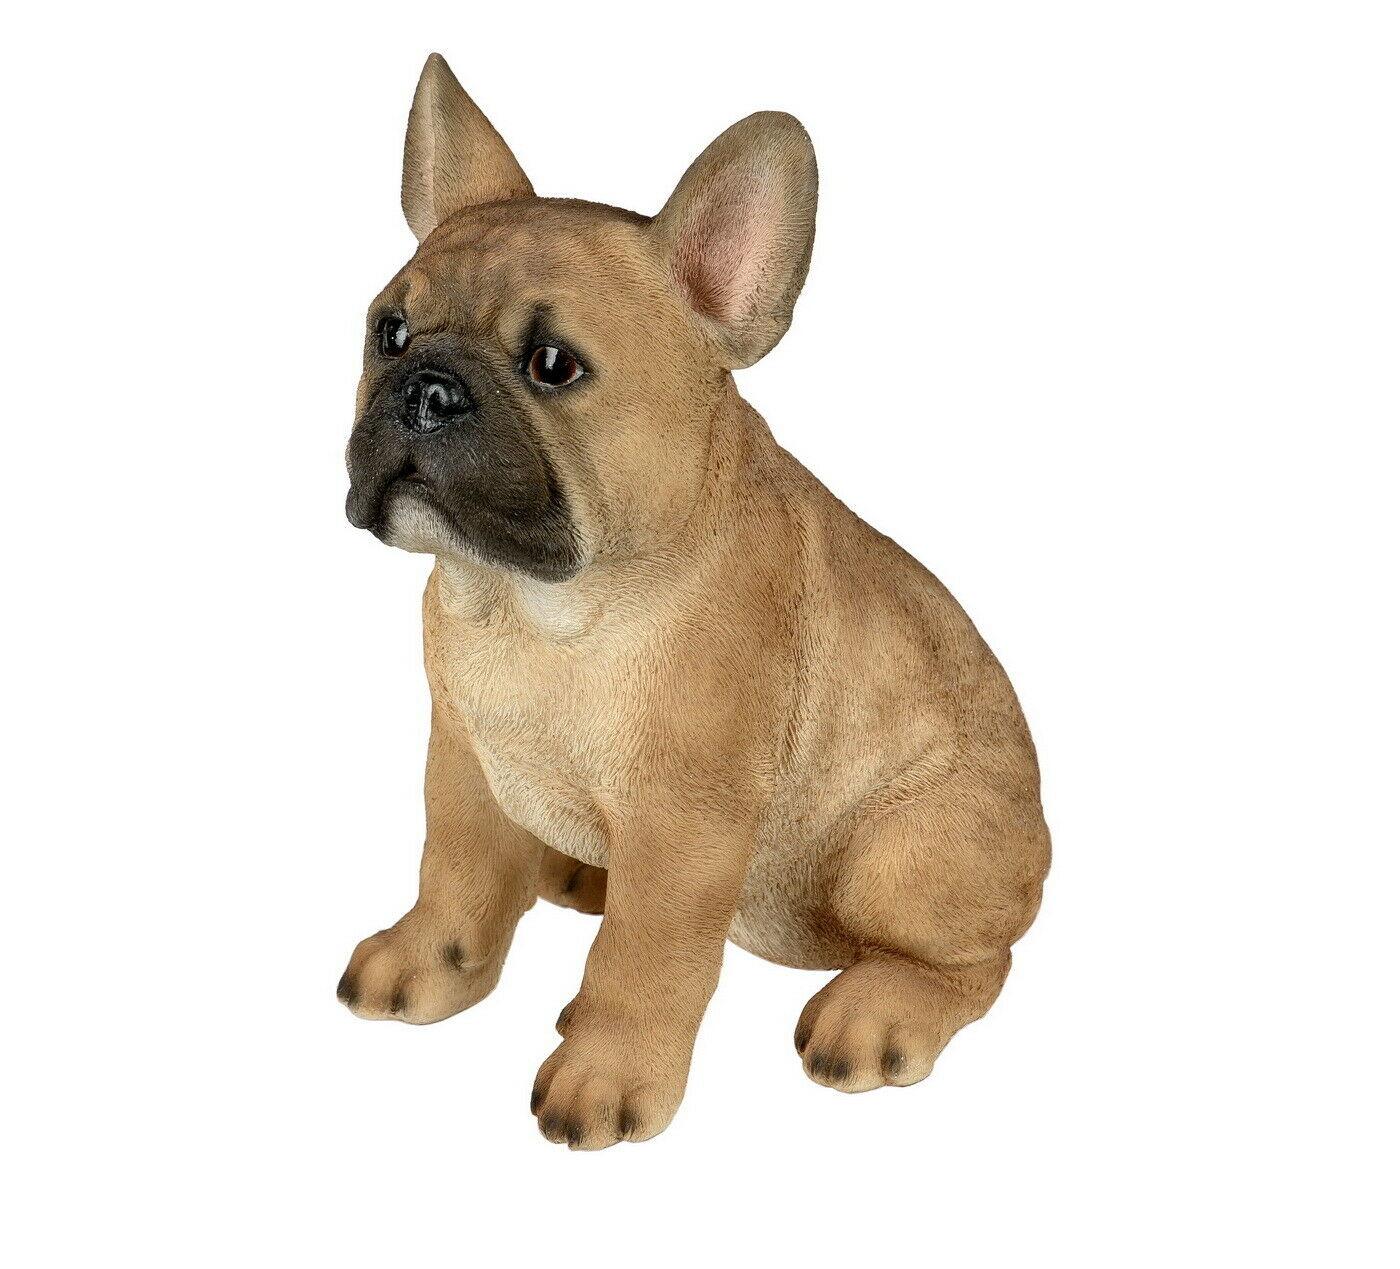 mops hund bulldogge dogge deko garten tier figur skulptur statue bull terrier